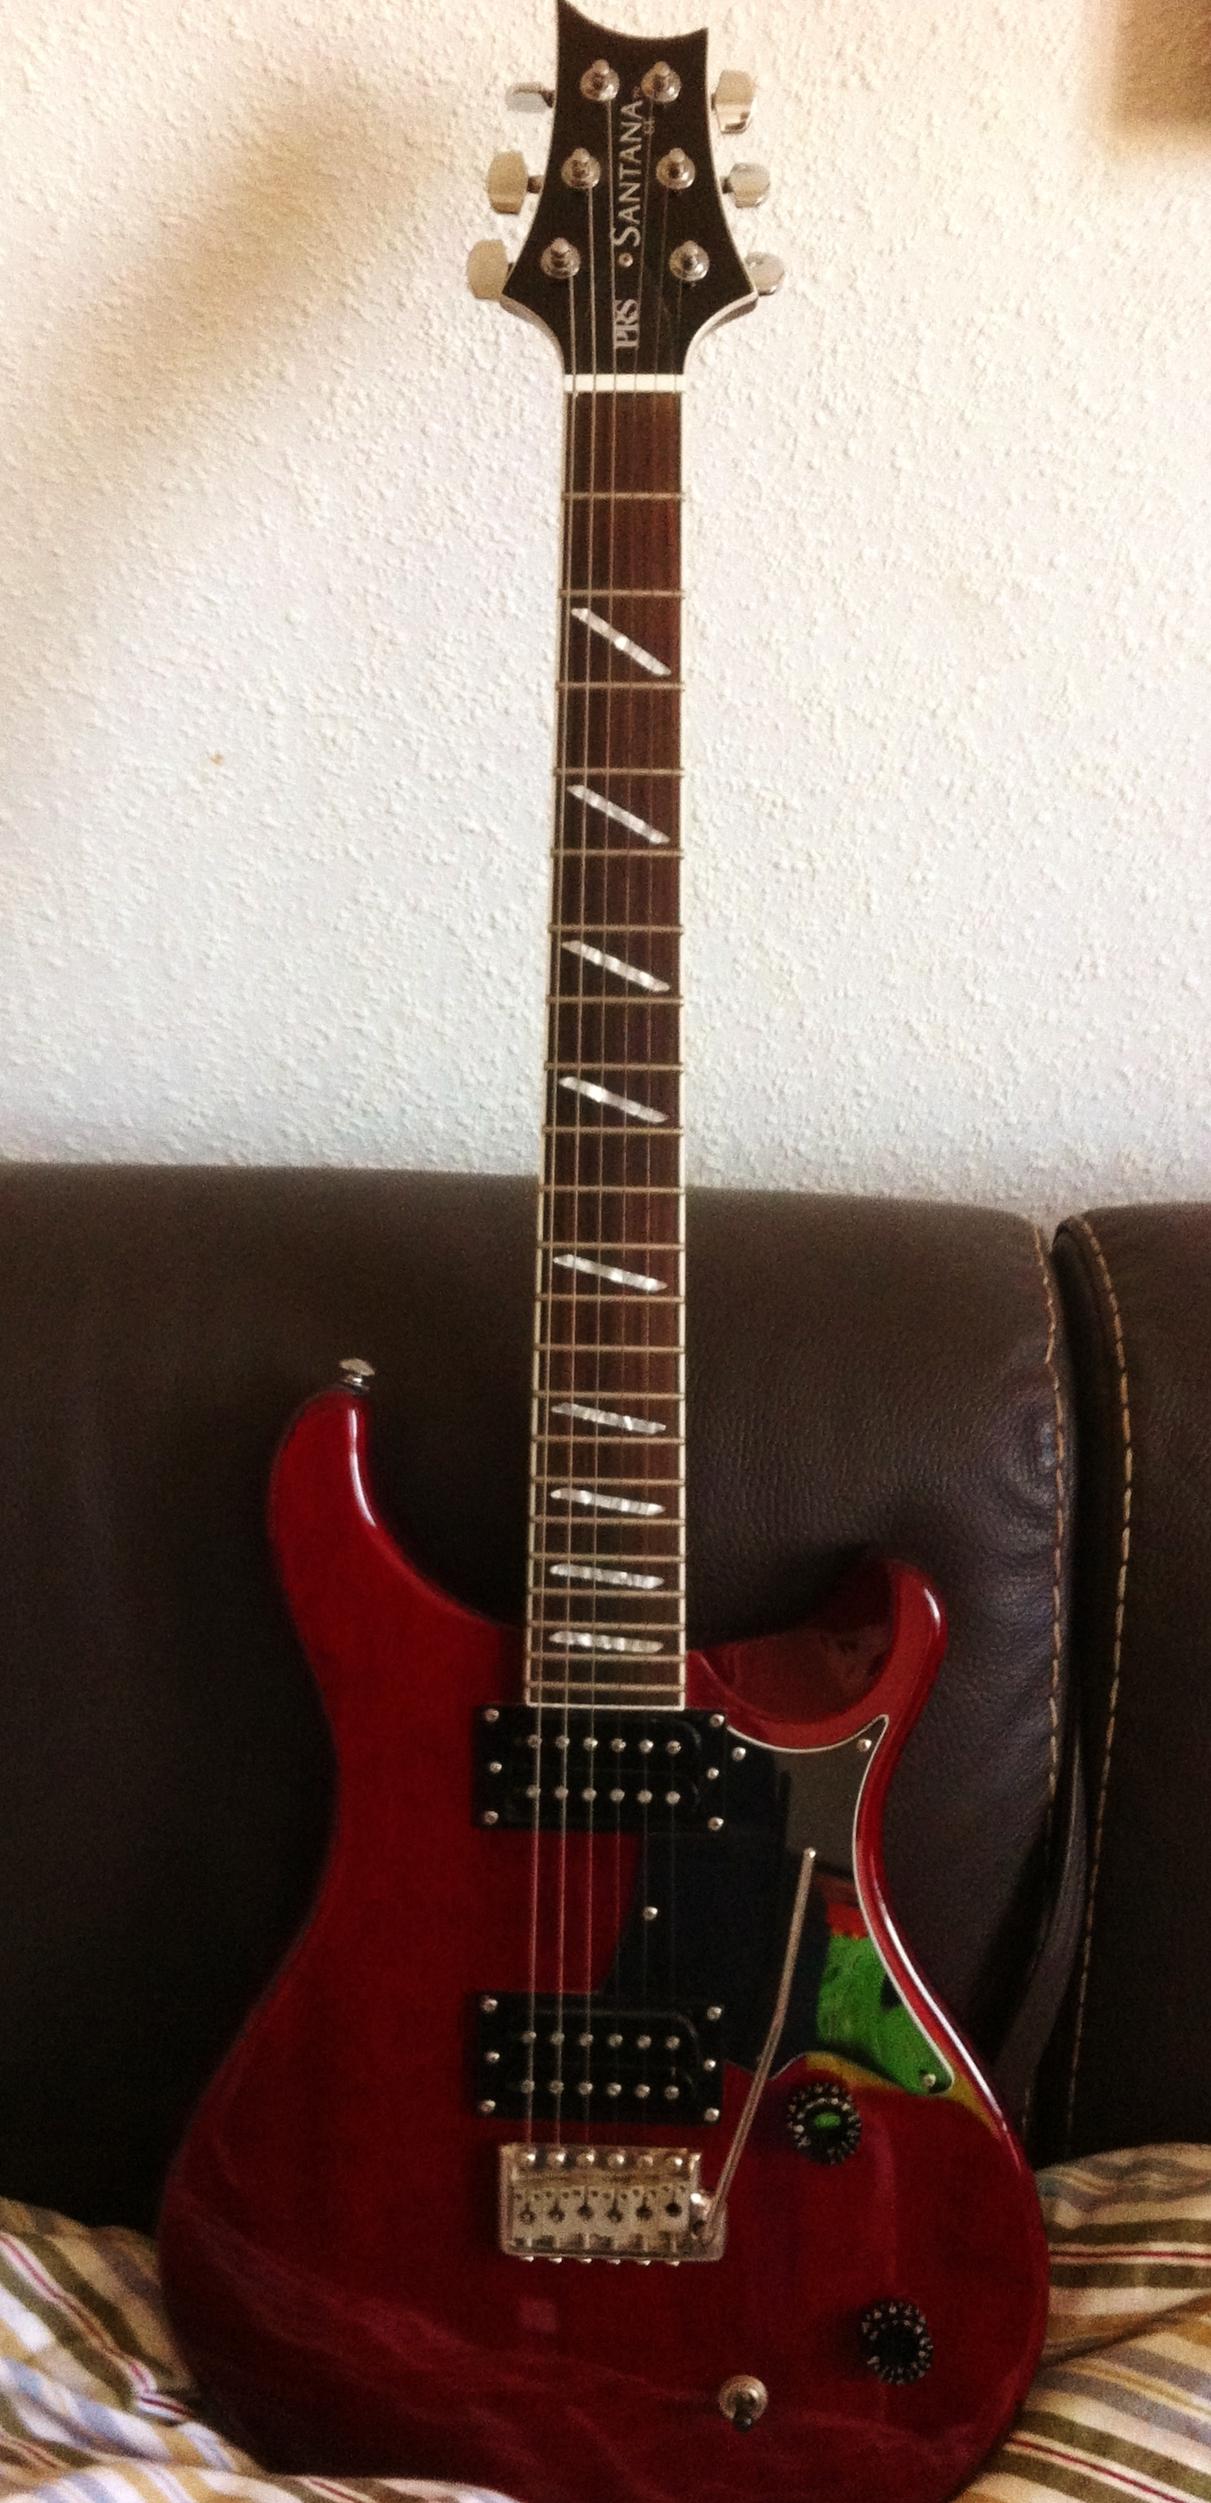 Santana redd